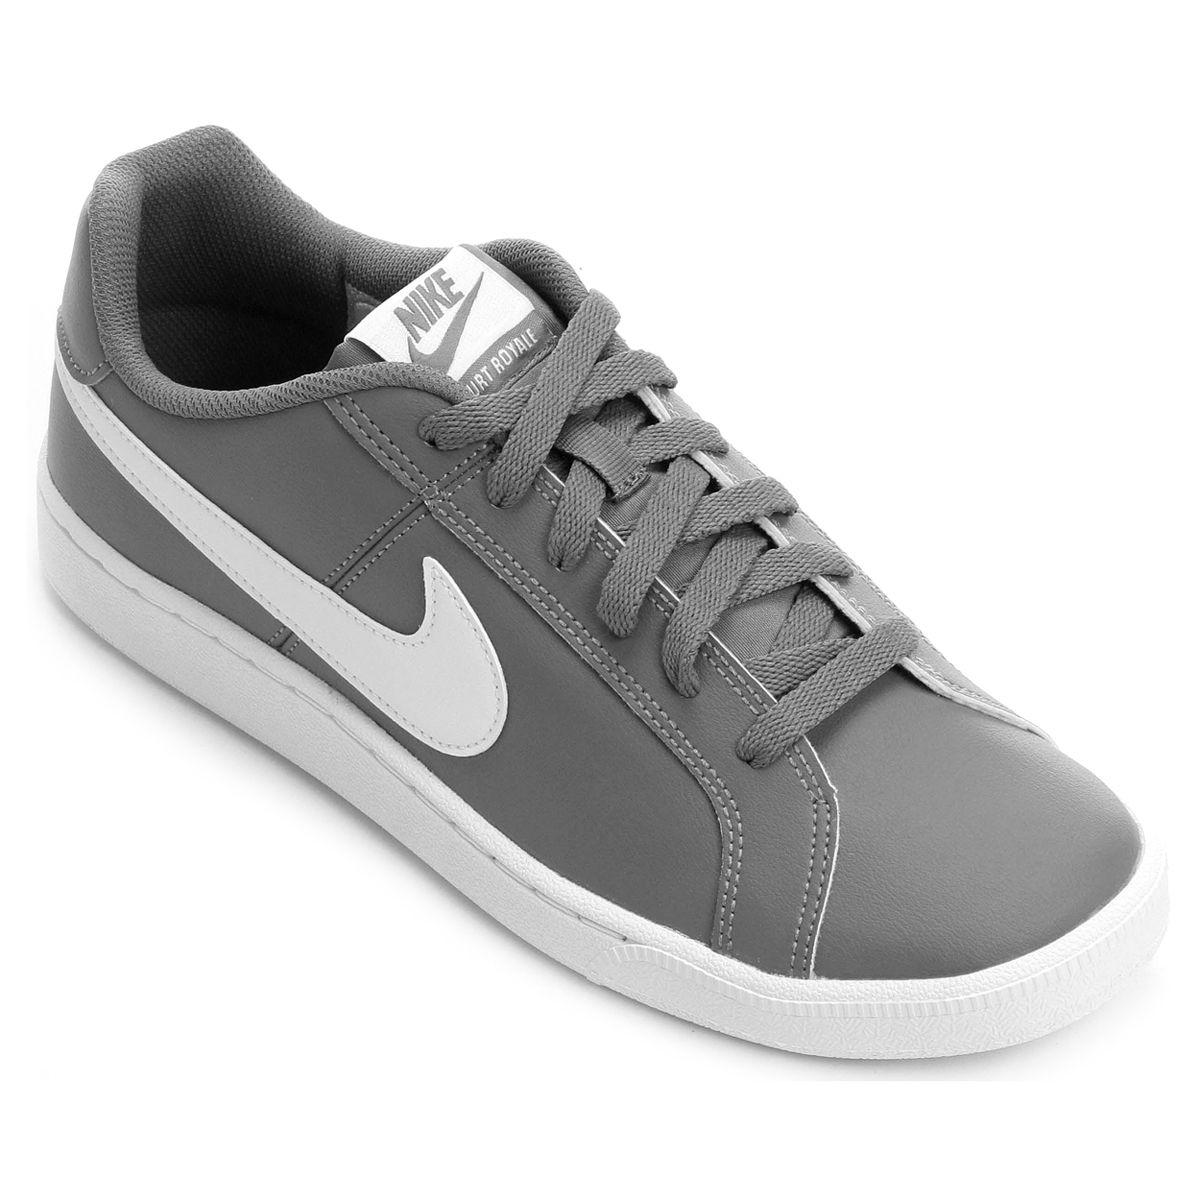 a41e03594 Tênis Couro Nike Court Royale Masculino - Cinza e Branco em 2019 ...